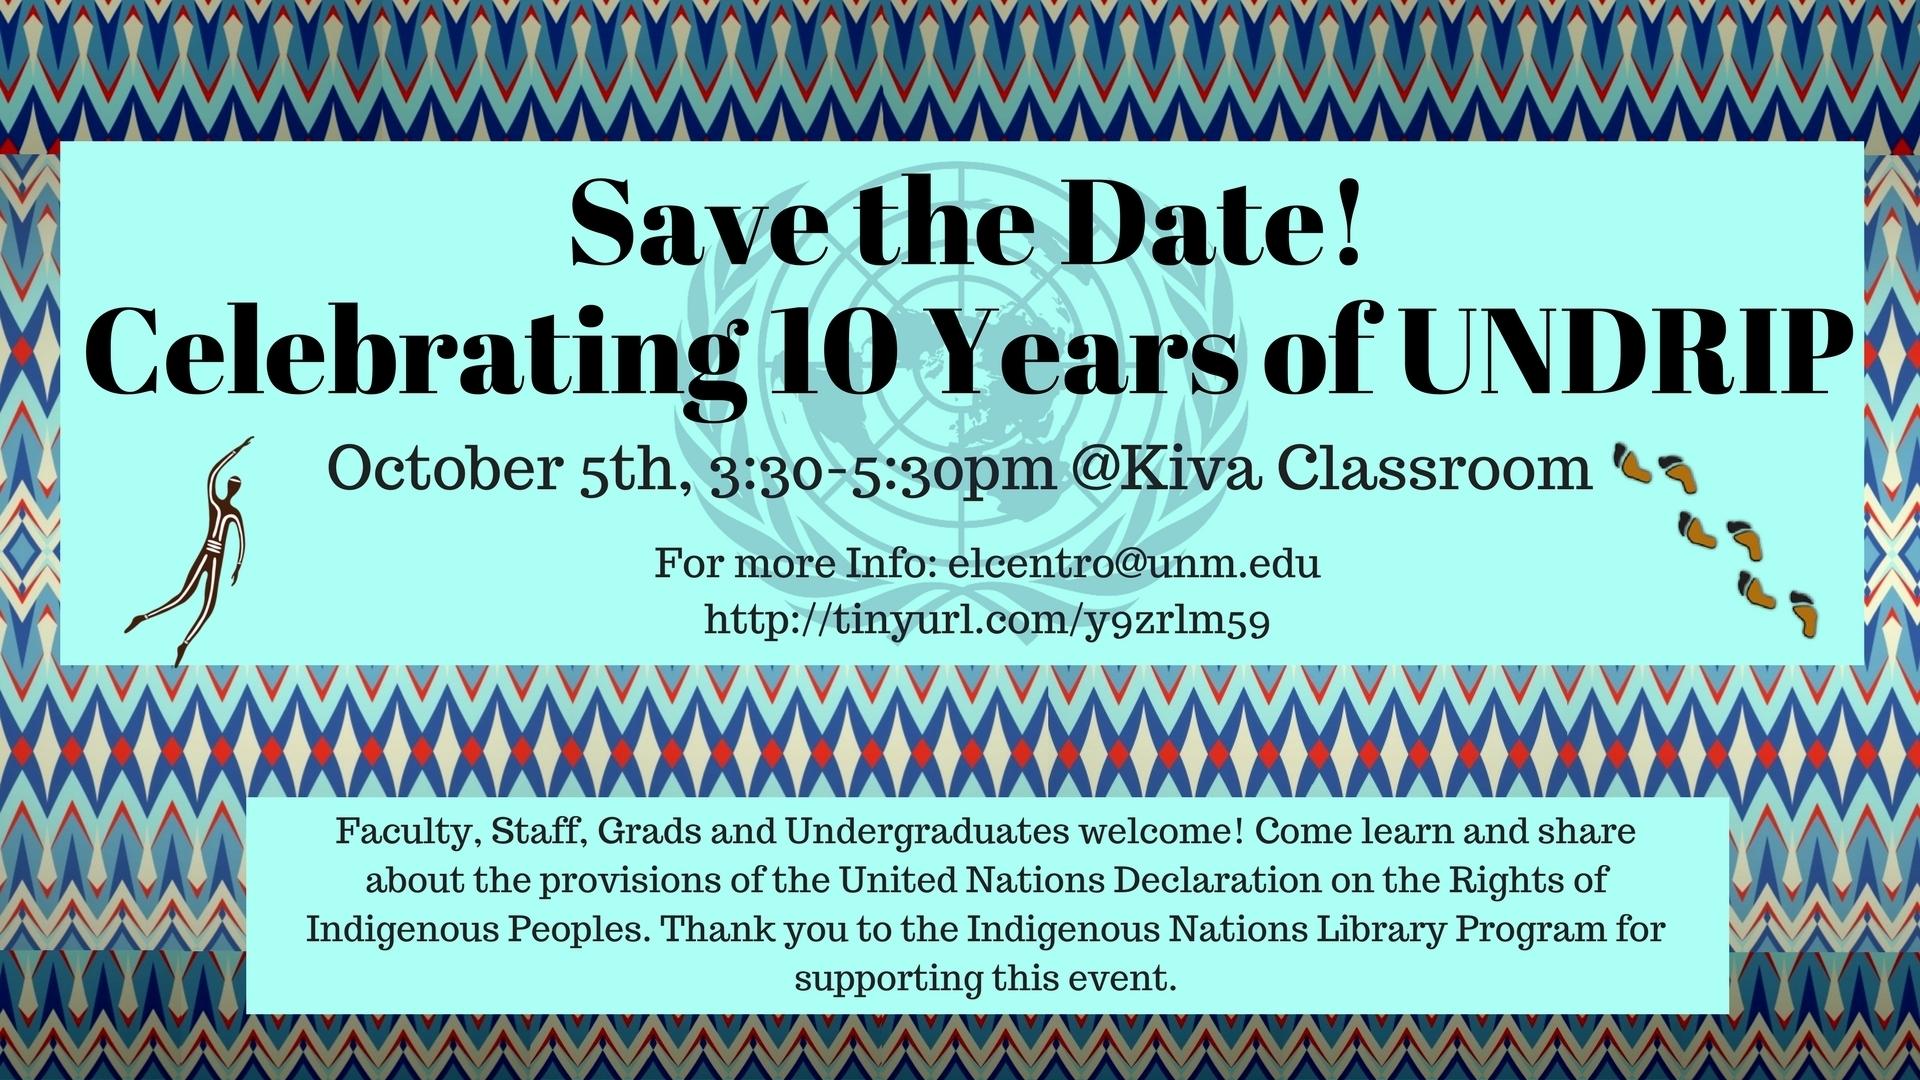 Unm Events Calendar - Celebrating Ten Years Of Undrip